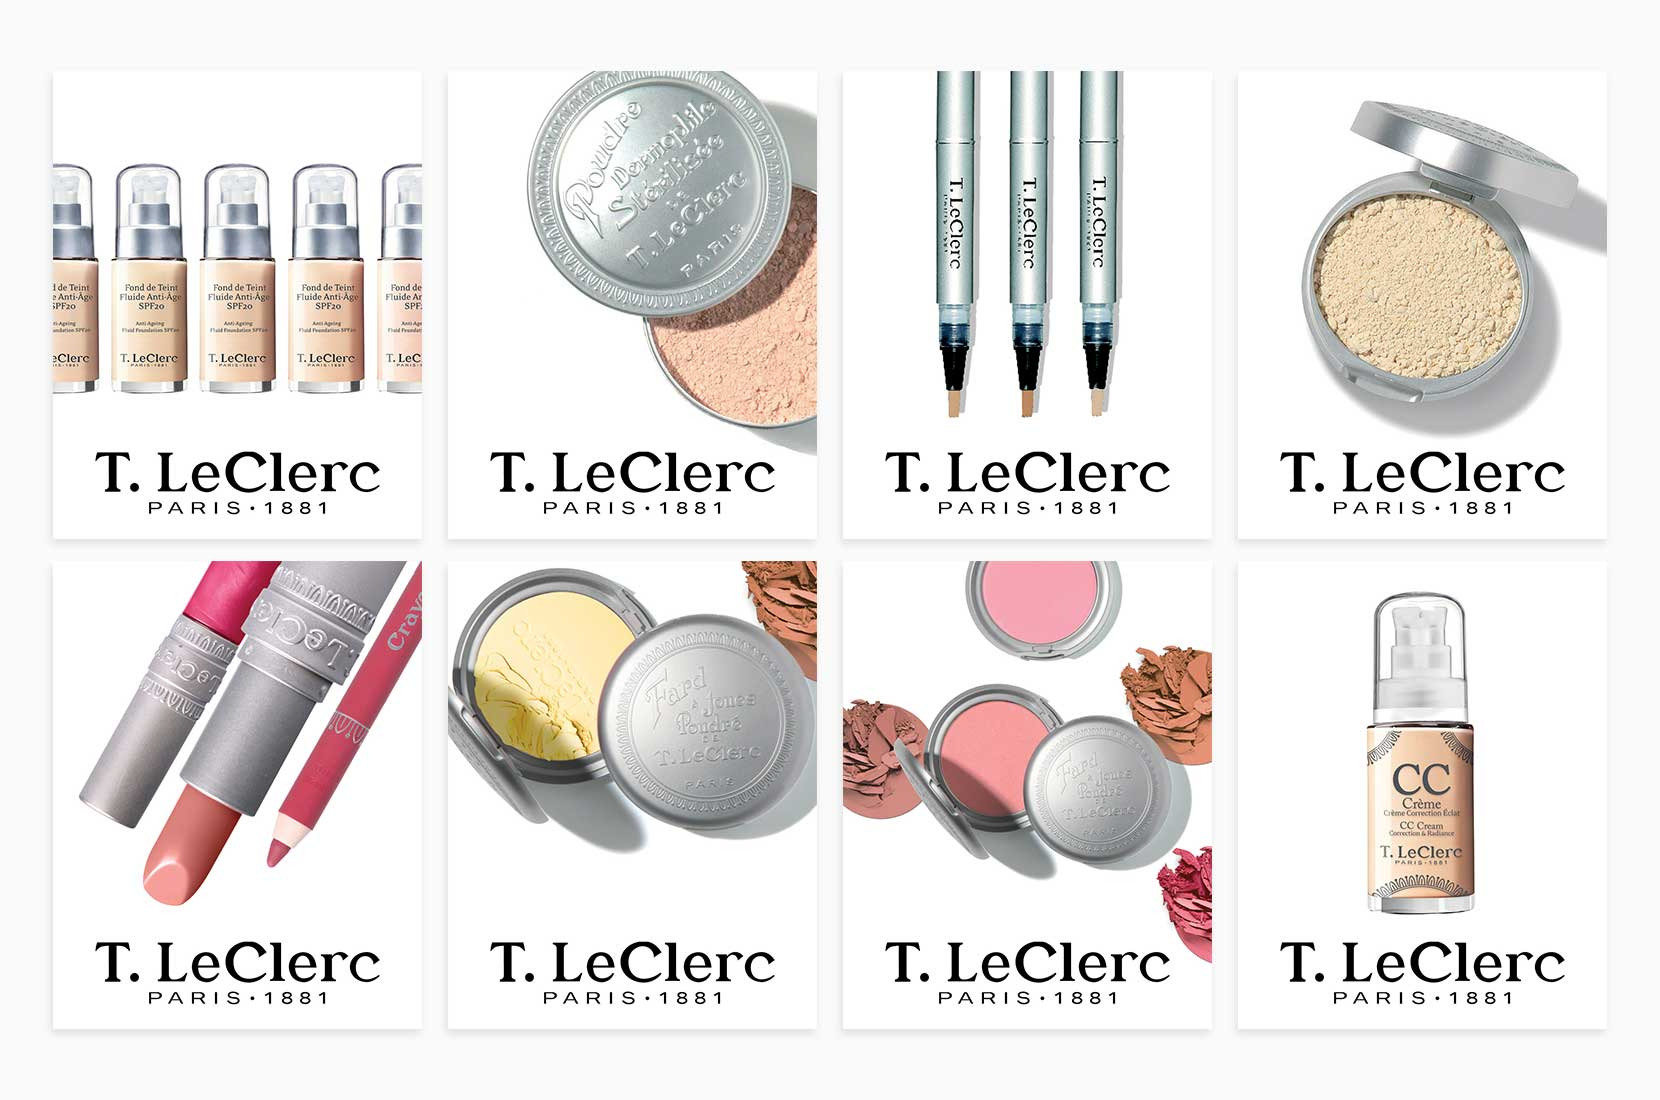 T. LeClerc Makeup Cards